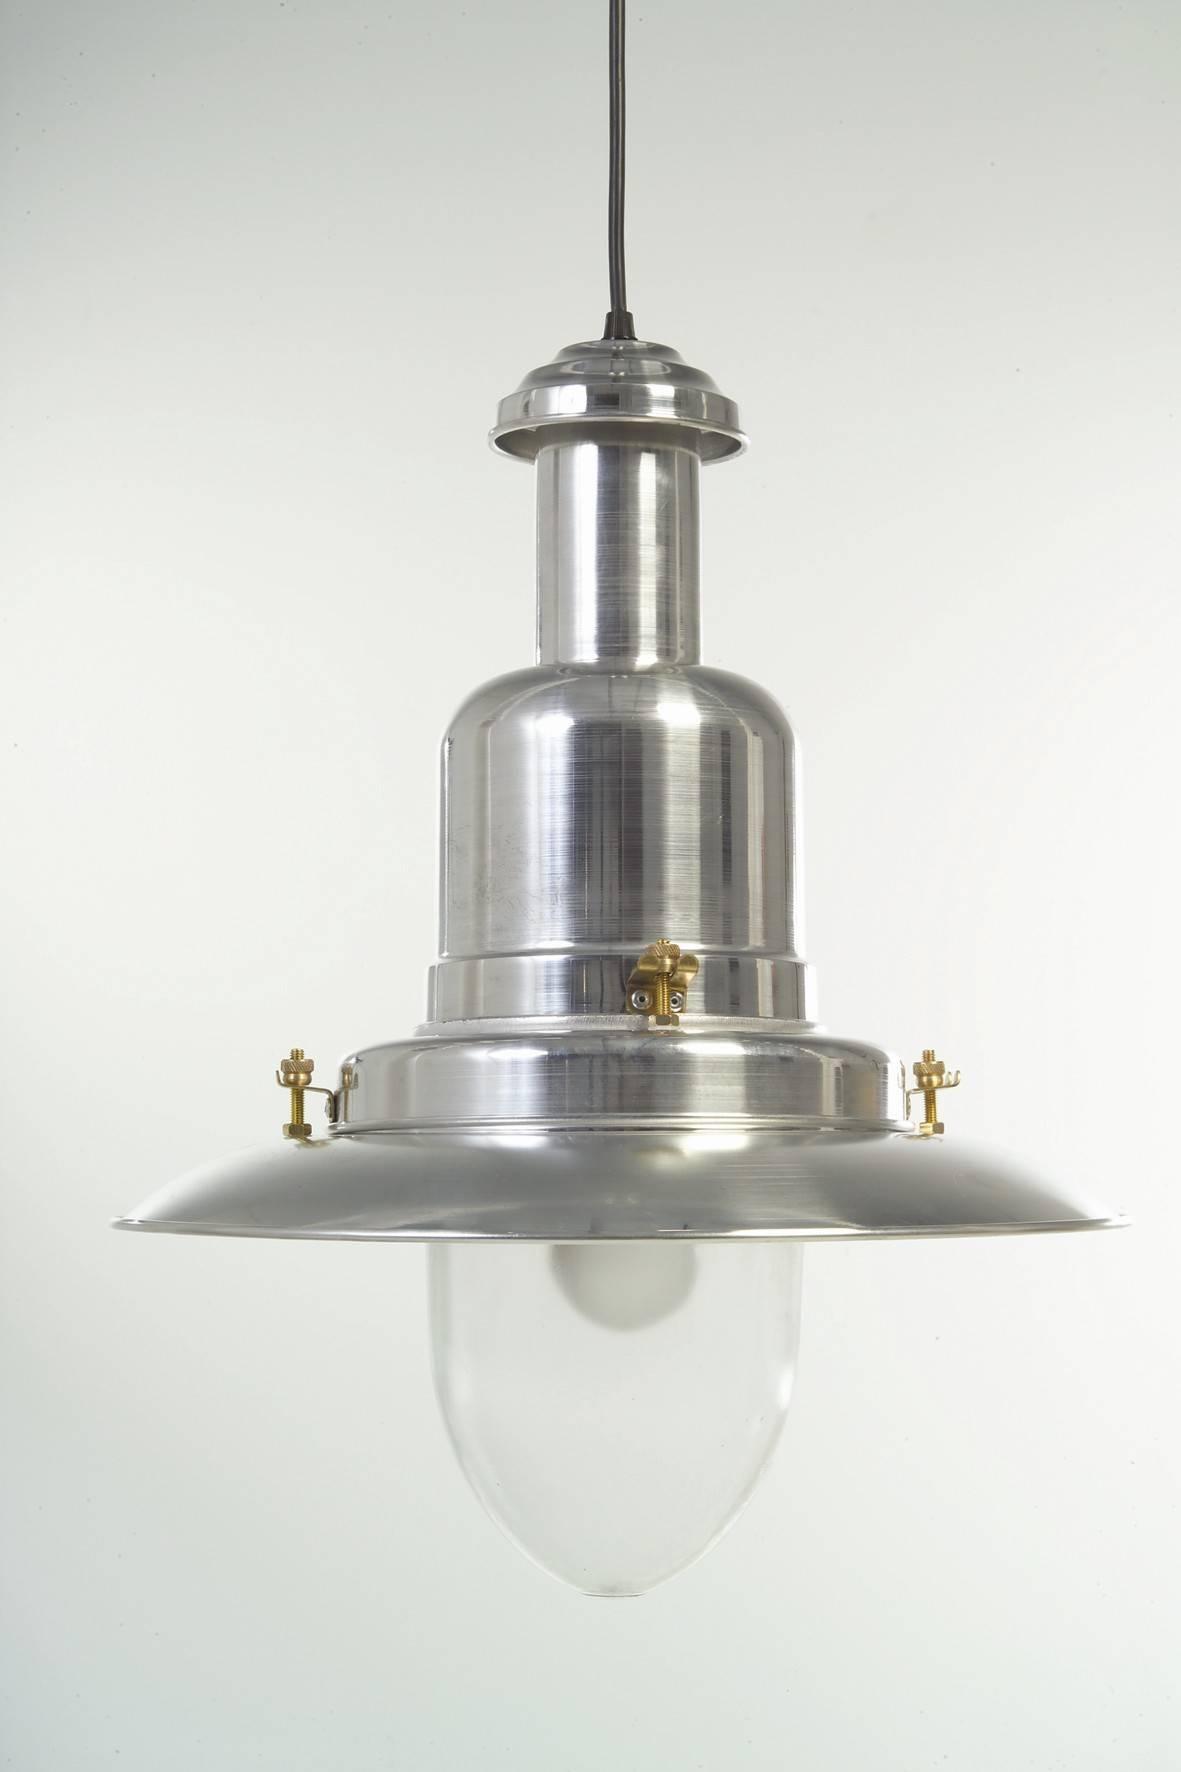 Stainless Steel Pendant Light Fixtures – Baby Exit In Stainless Steel Pendant Lighting (View 12 of 15)